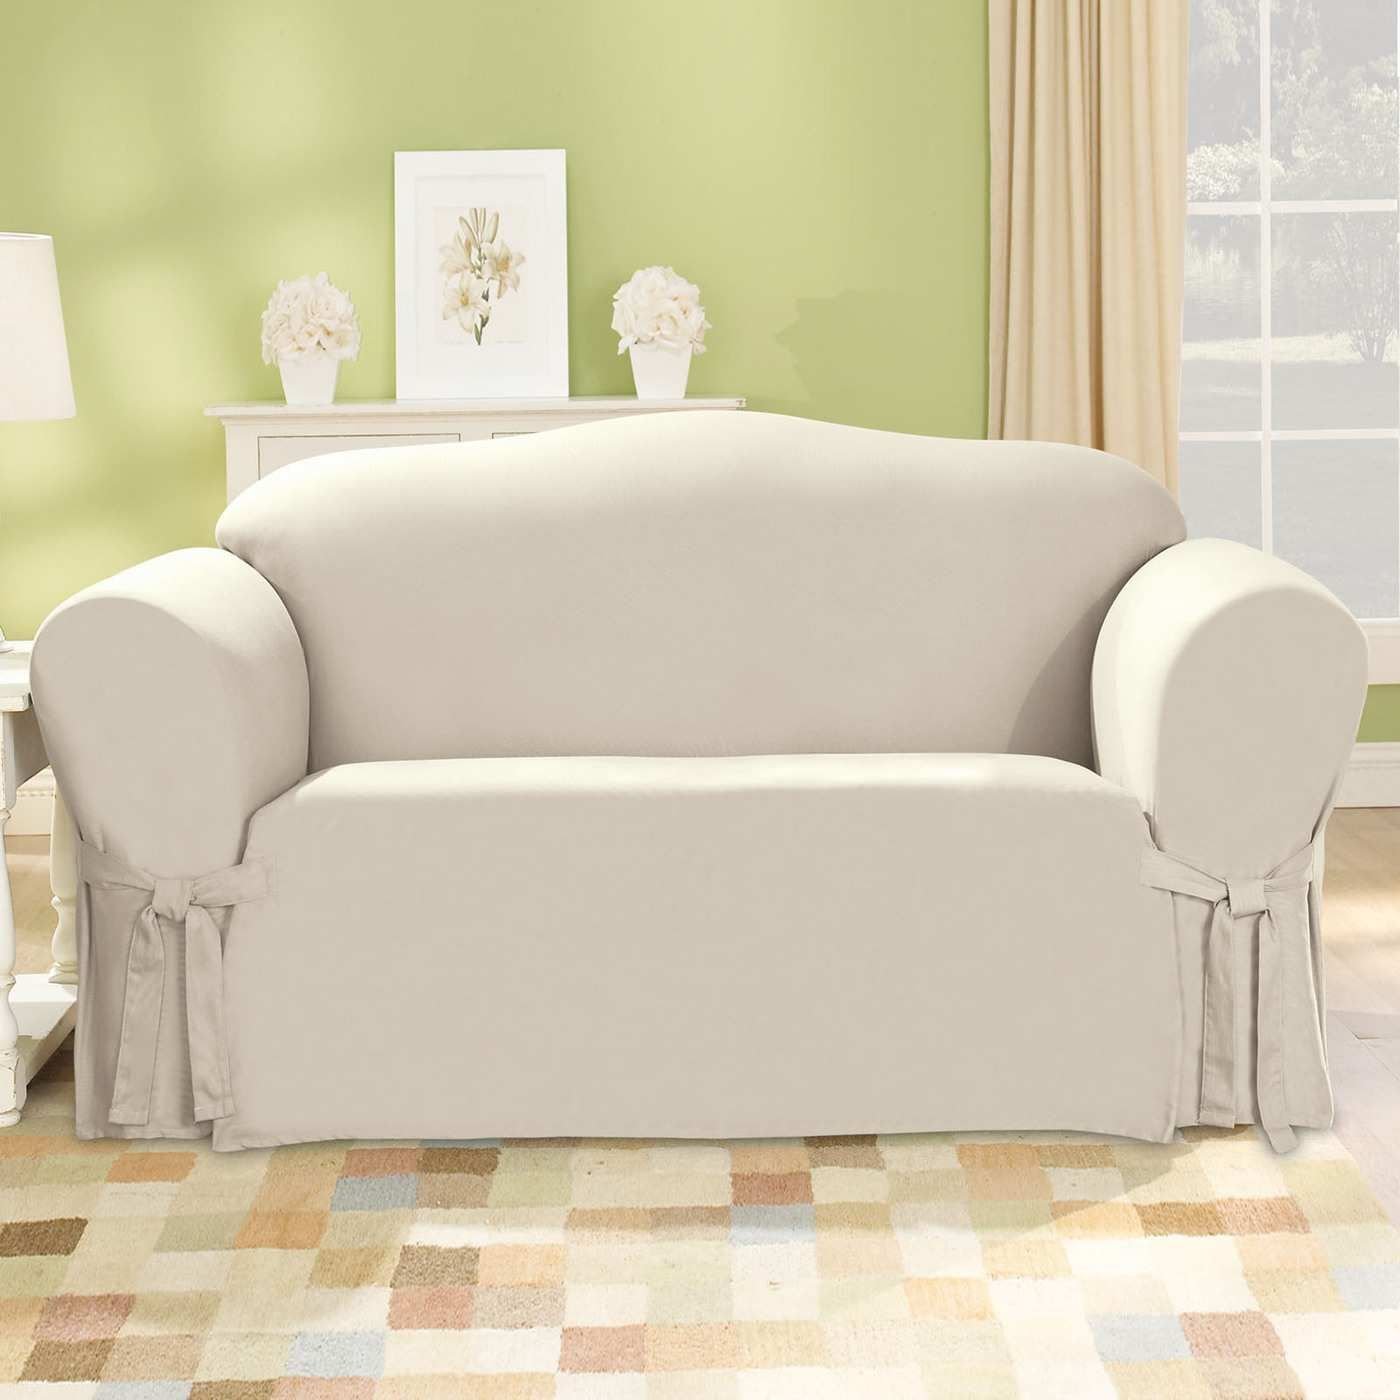 10 Sears Sofa Covers Stylish As Well